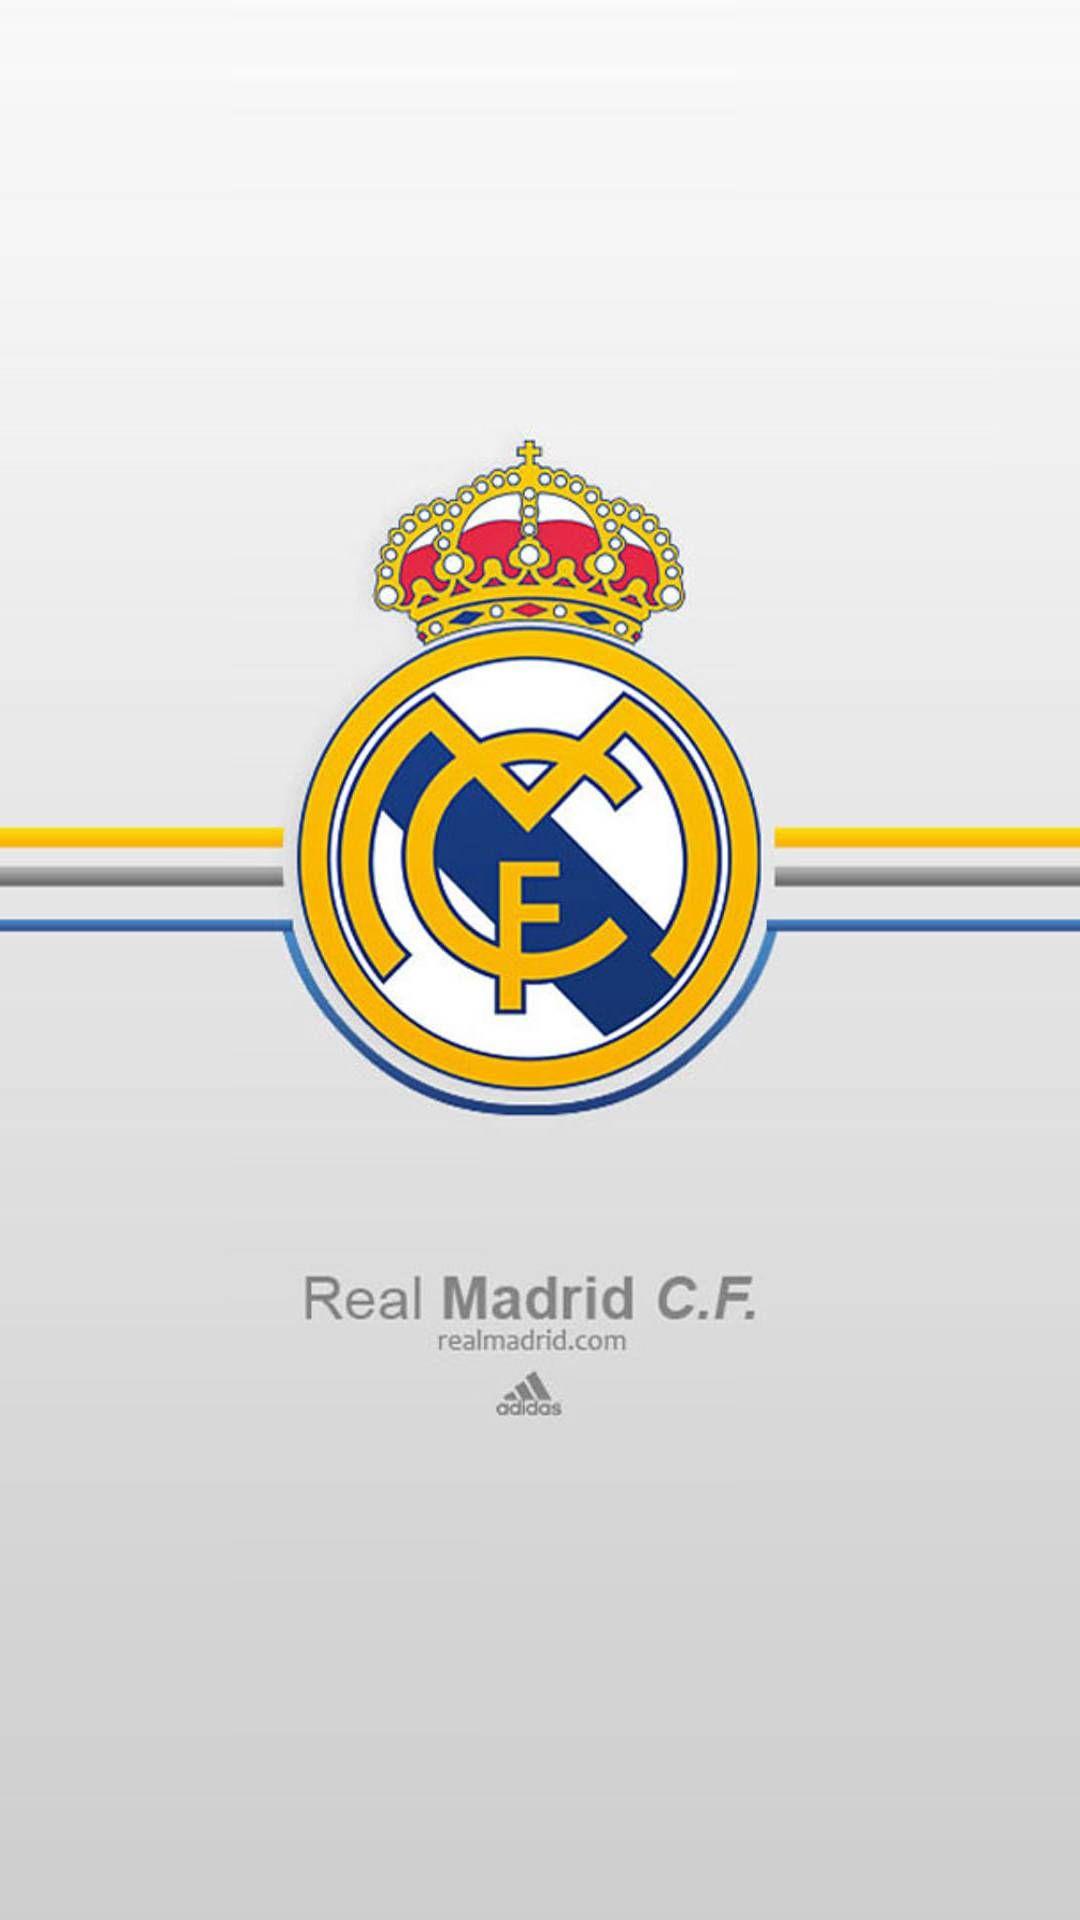 Real Madrid Cf Phone Tablet Wallpaper White Background Design In 2020 Real Madrid Wallpapers Madrid Wallpaper Real Madrid Logo Wallpapers